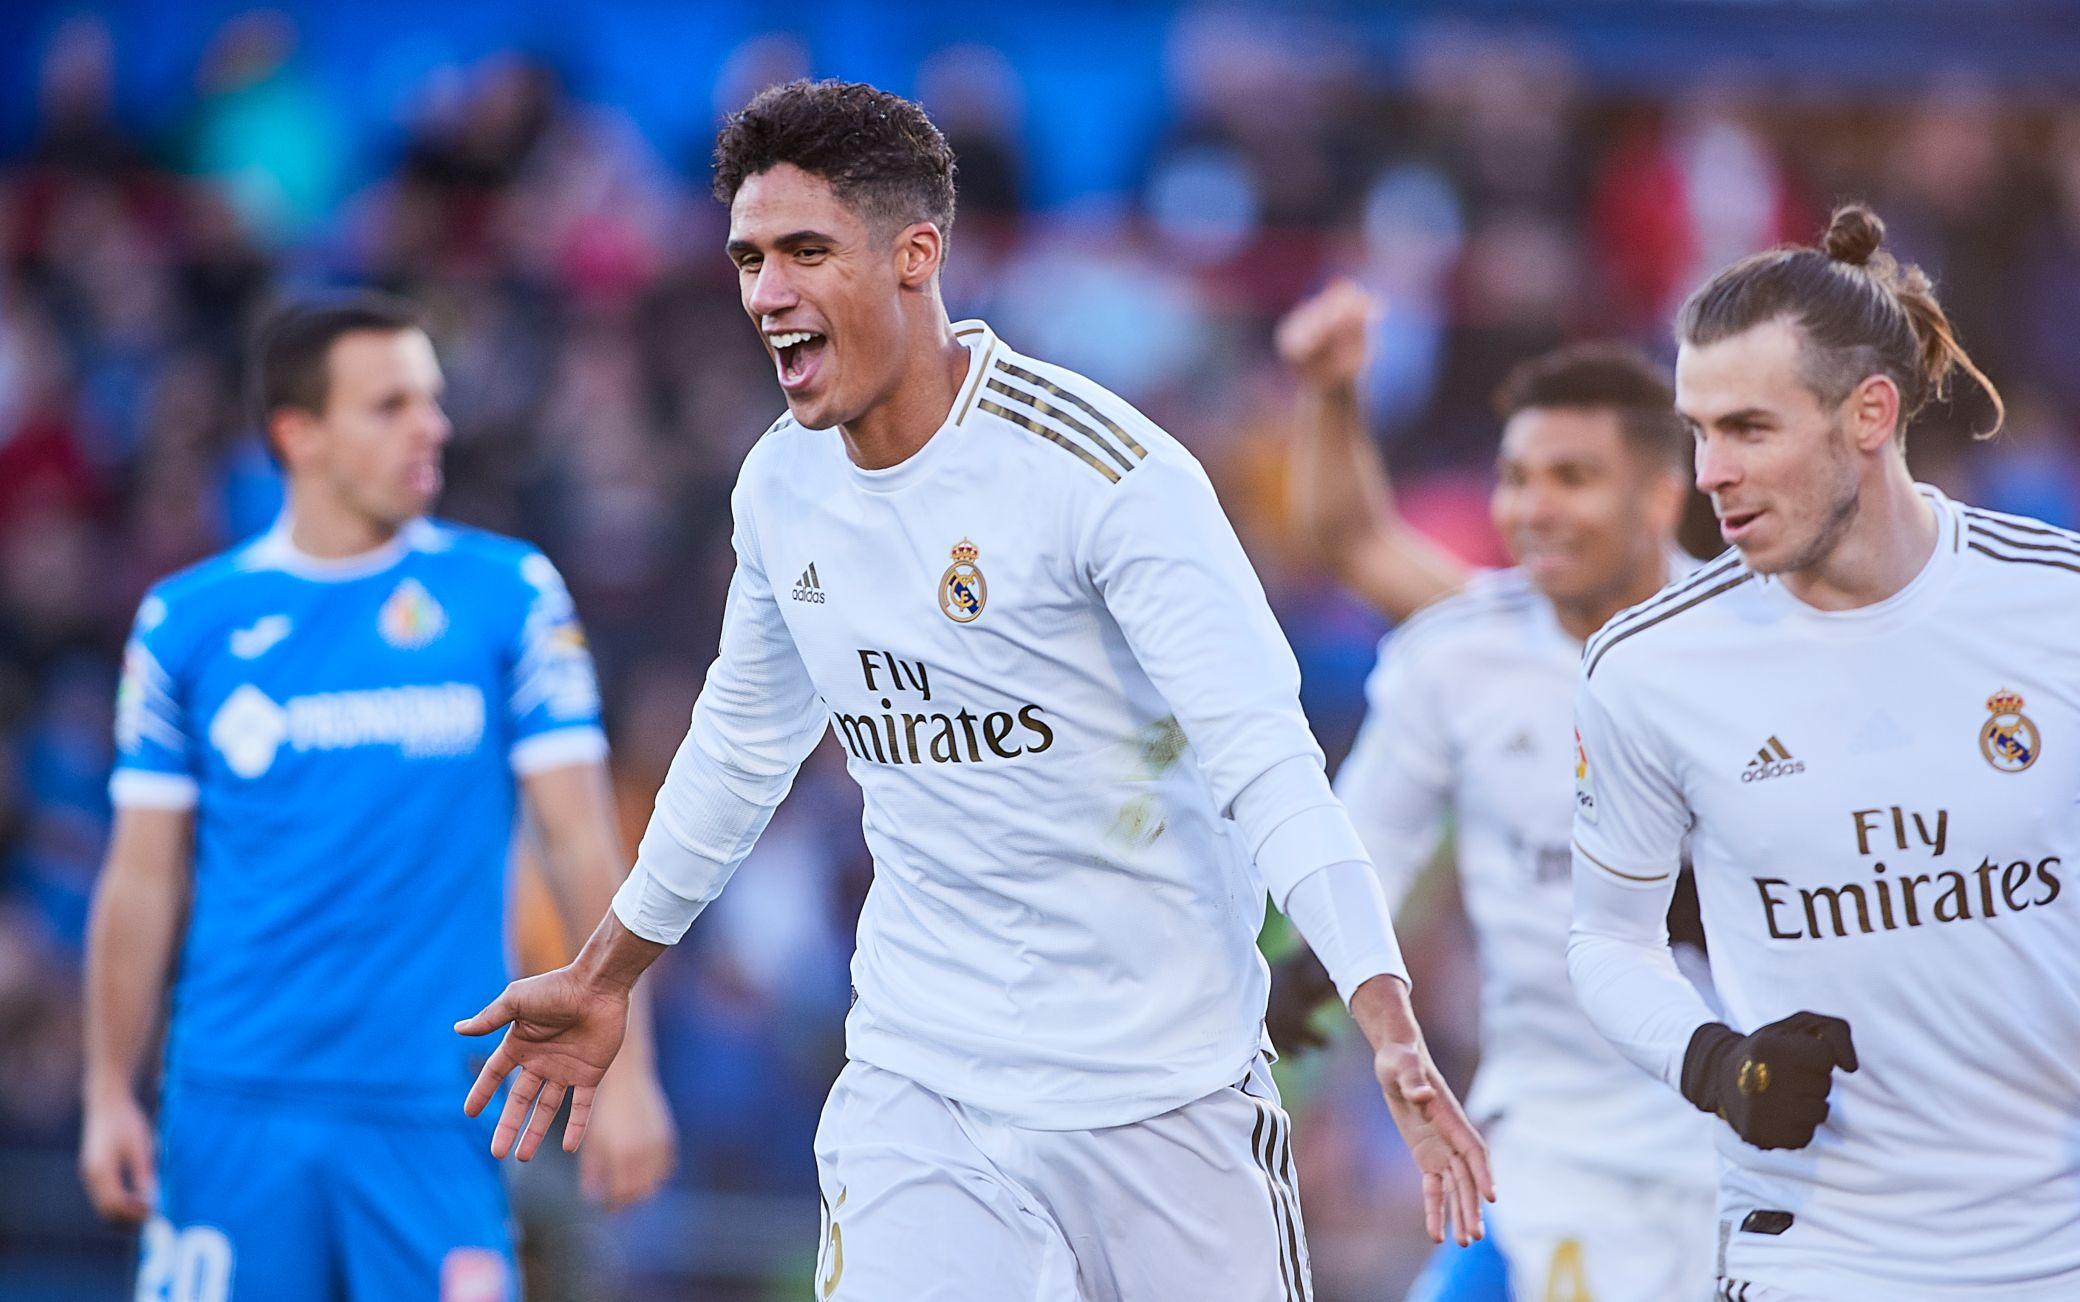 Getafe-Real Madrid 0-3: decidono i gol di Varane e Modric